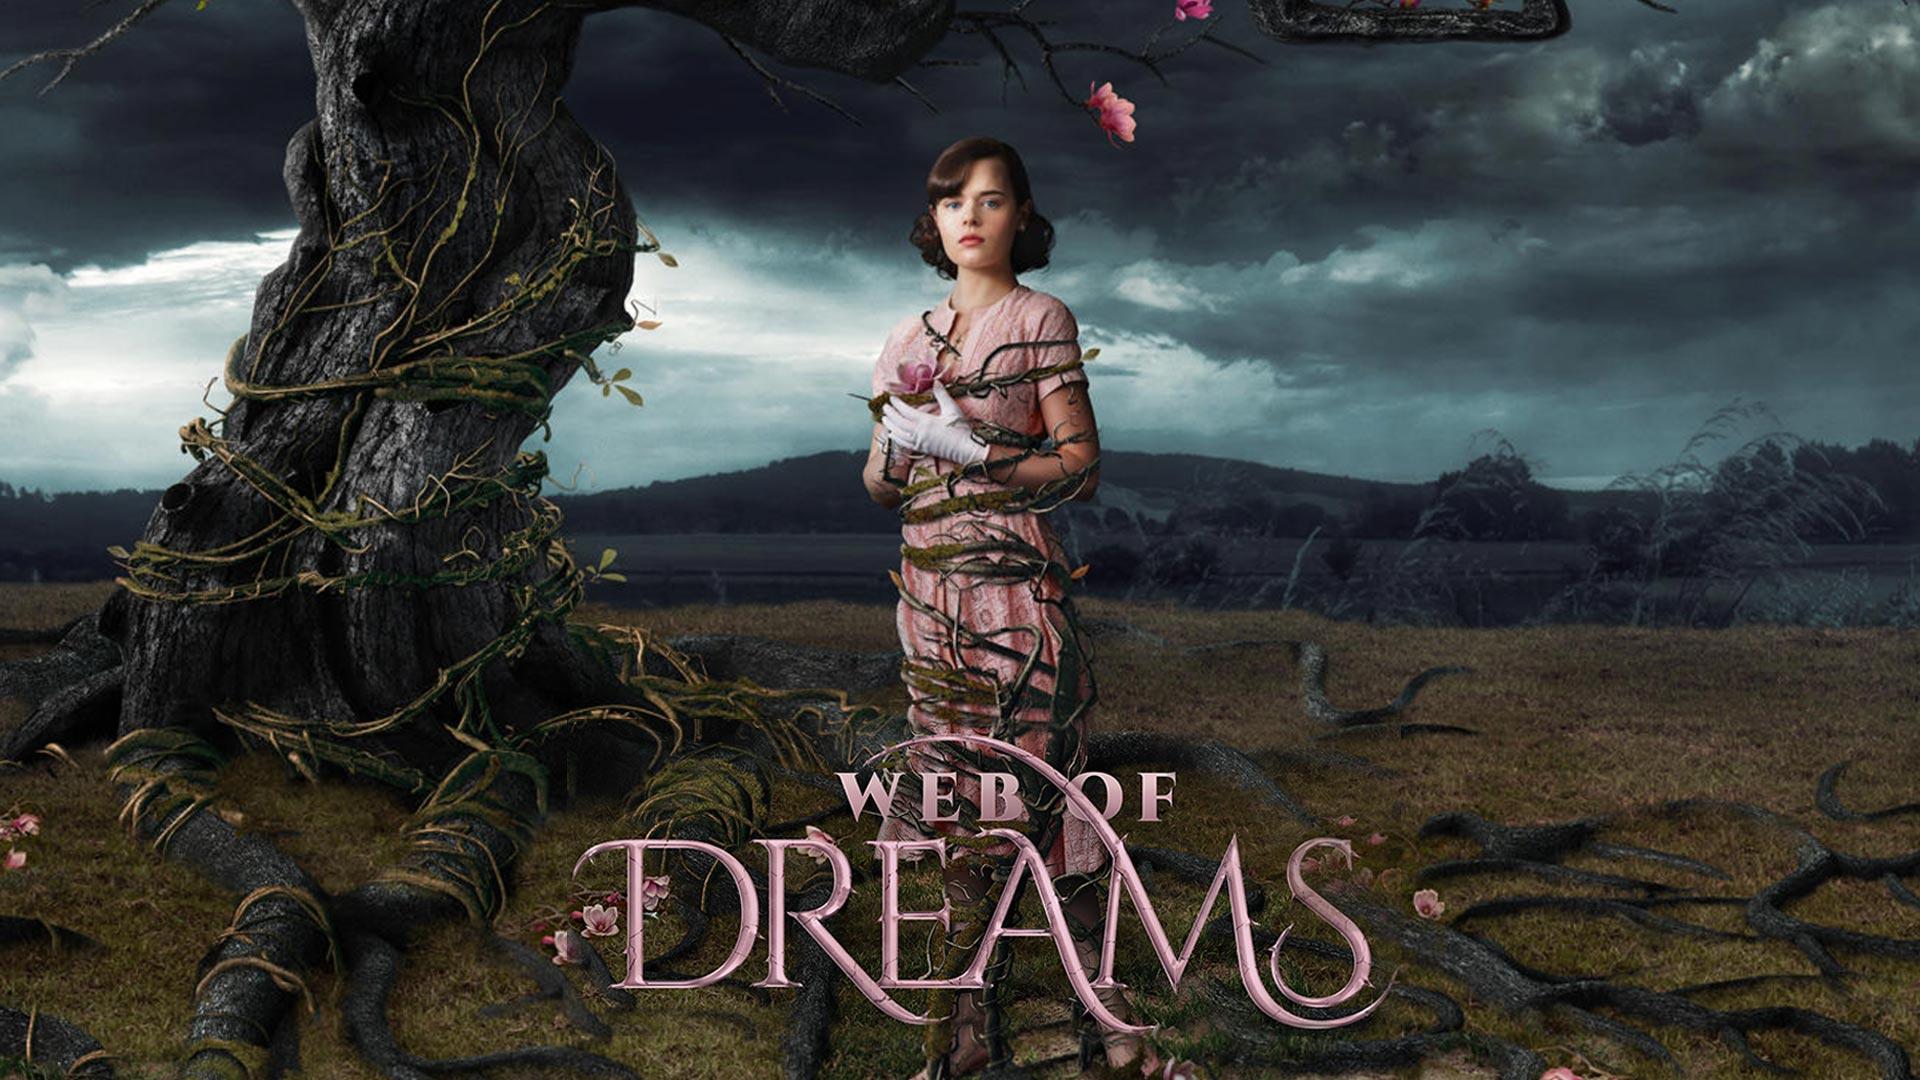 VC Andrews' Web of Dreams